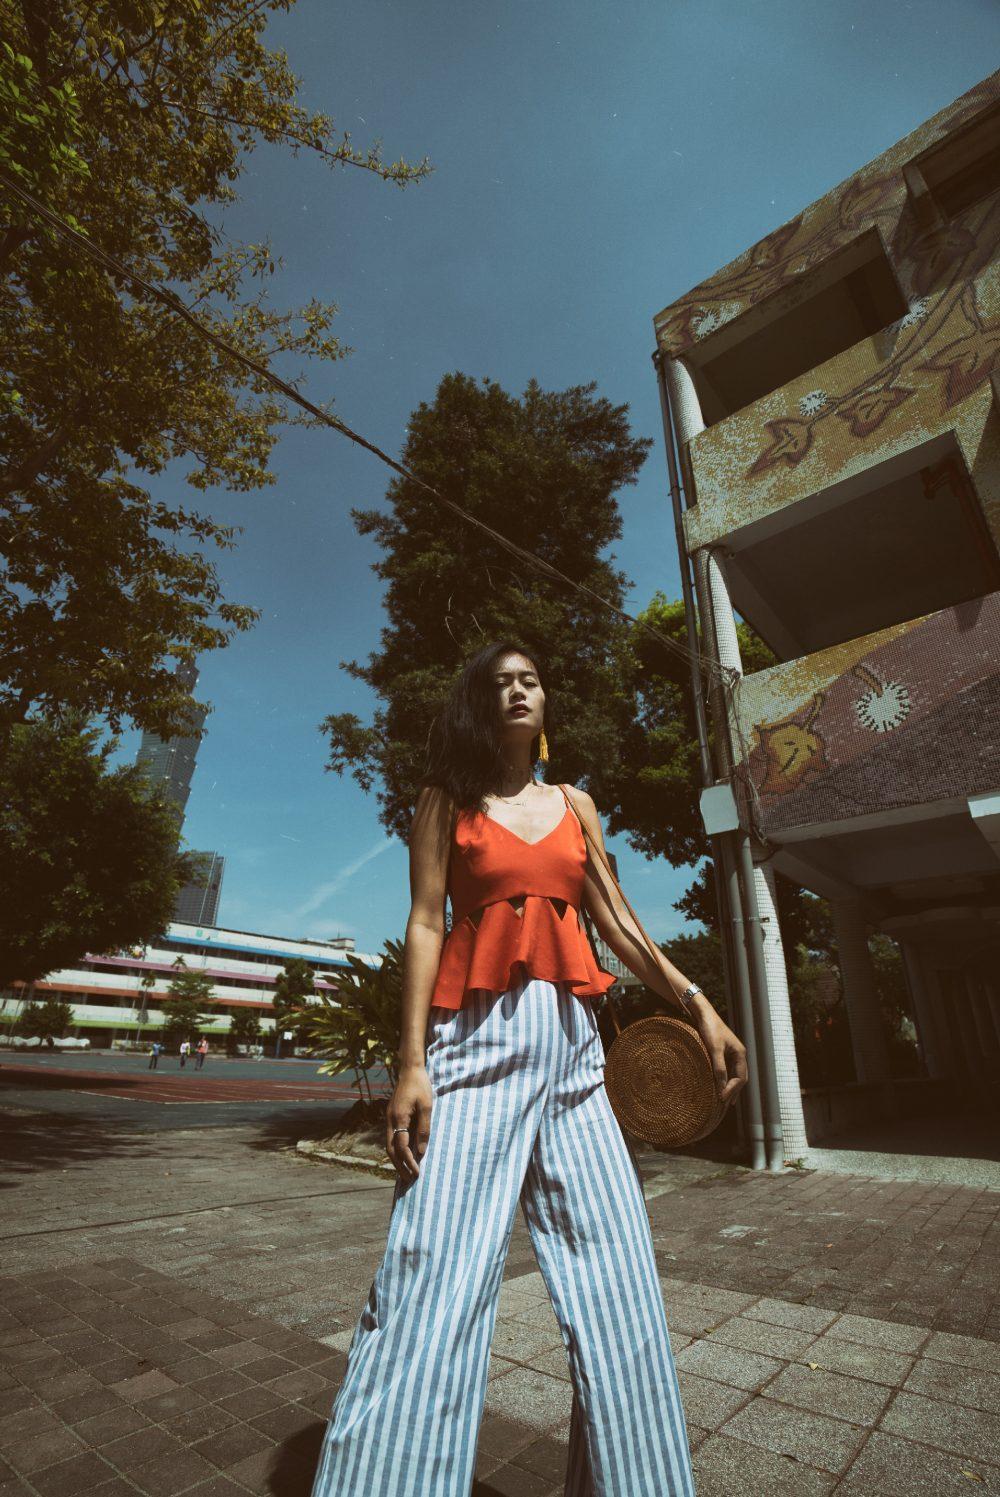 summer stylem heatwave, outlanderly, style tips, striped pants, summer dressing, spring heatwave, fashion blogger